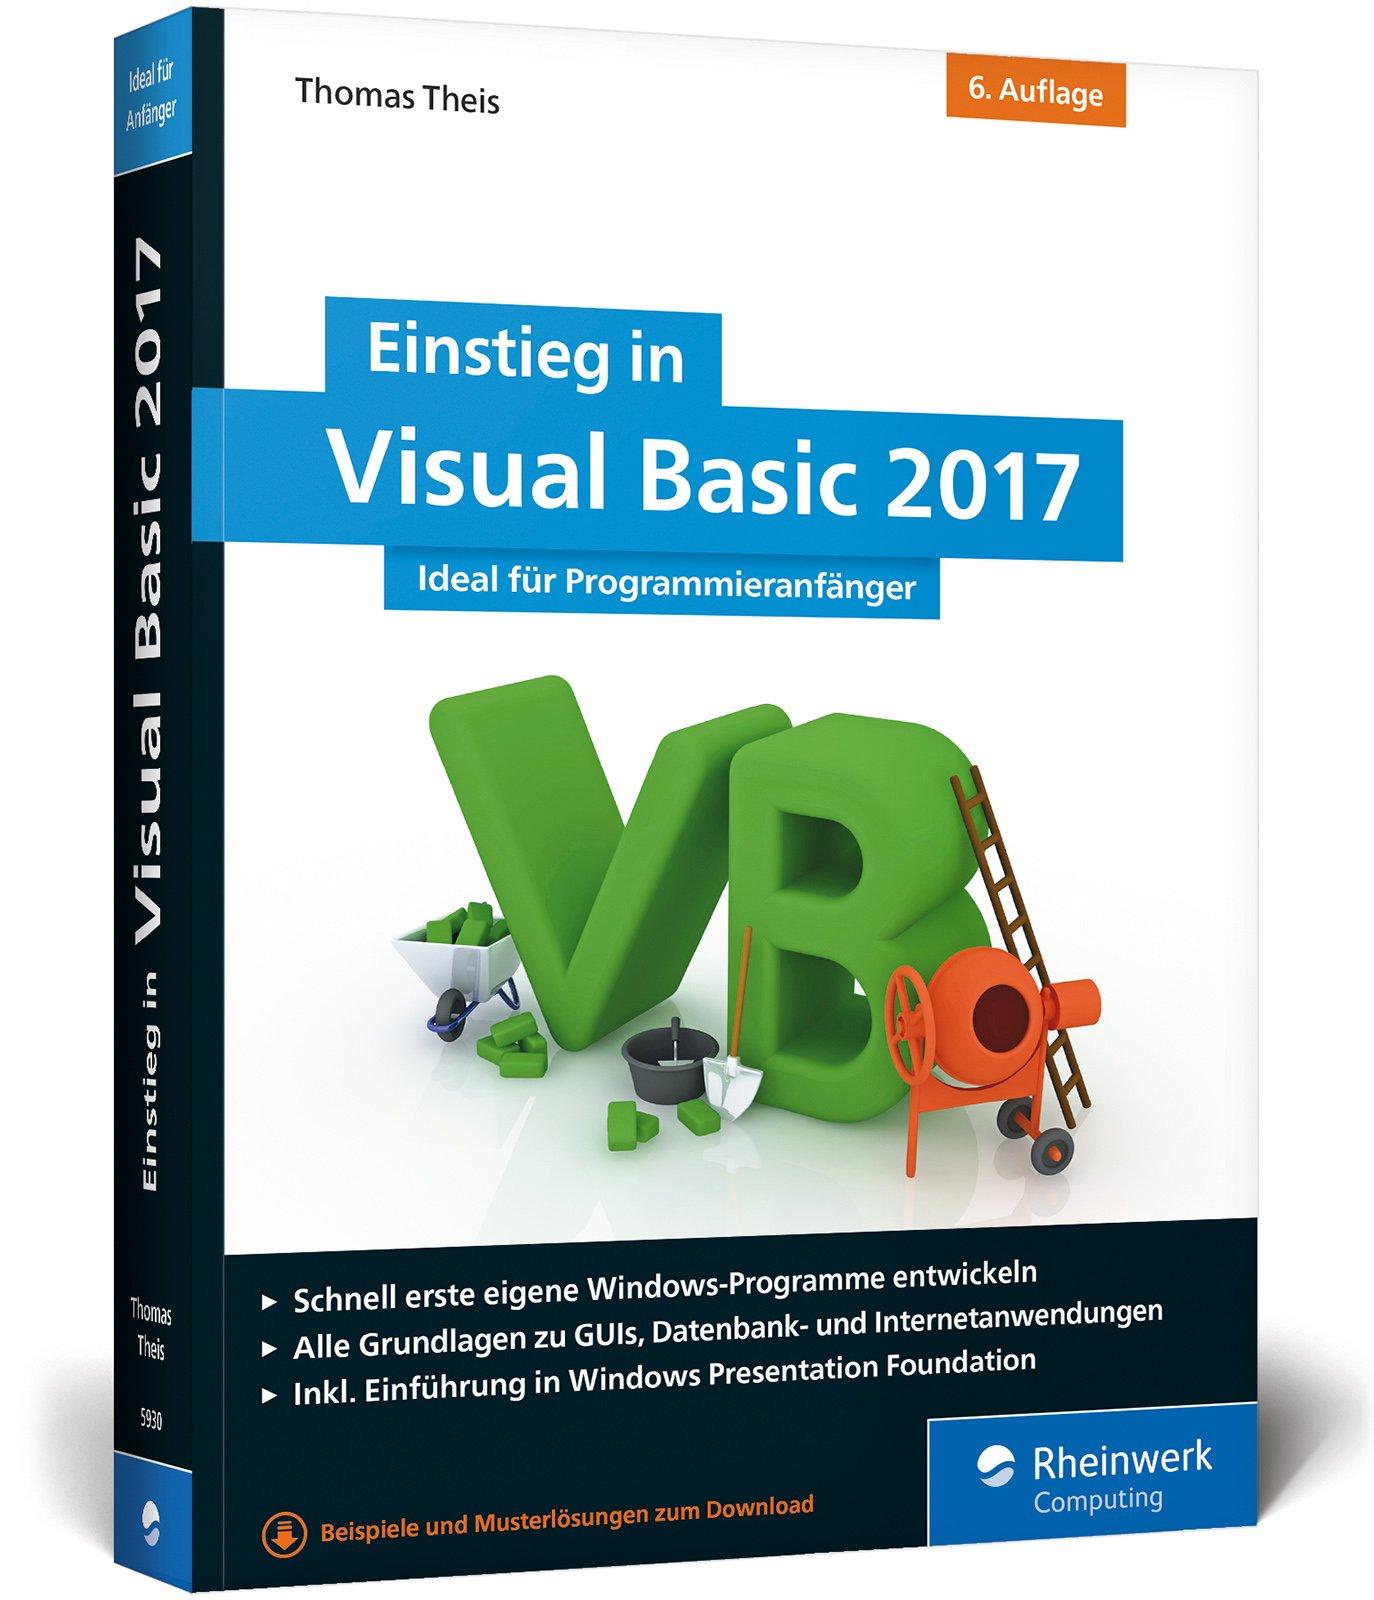 einstieg in visual basic 2017 9783836259309 amazoncom books - Visual Basic Beispiele